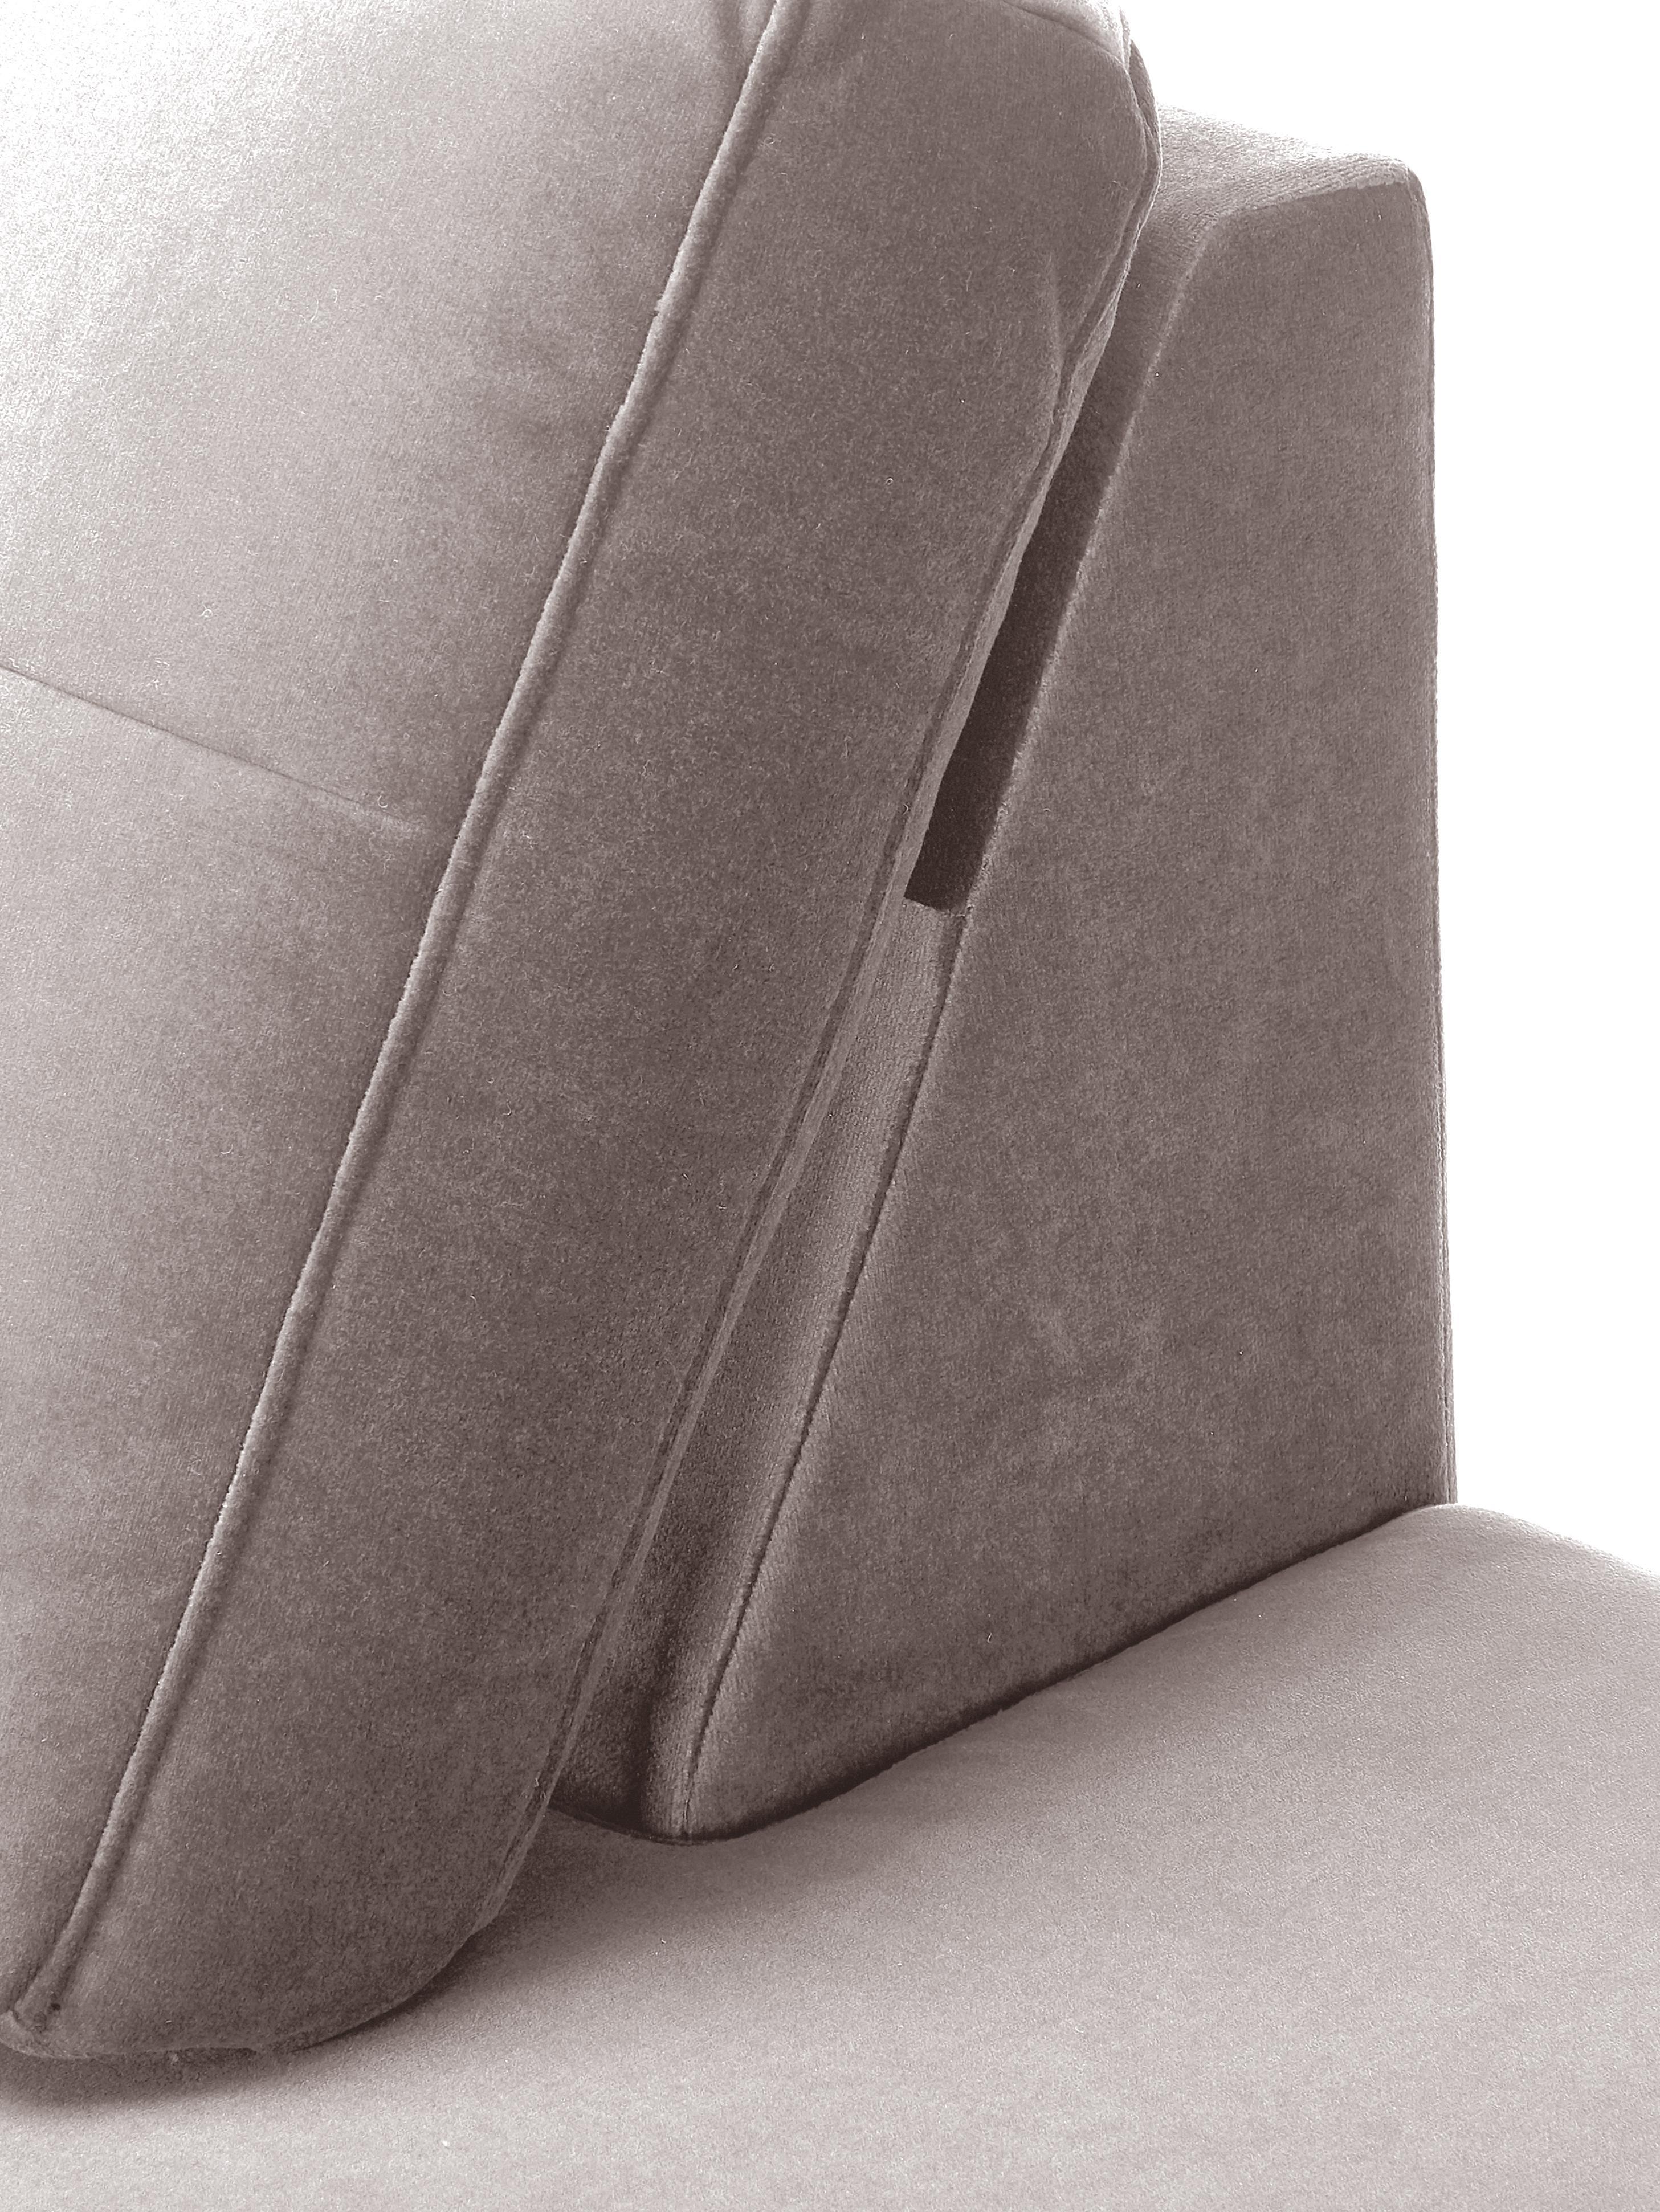 Samt-Ottomane Alva, Bezug: Samt (Hochwertiger Polyes, Gestell: Massives Kiefernholz, Füße: Massives Buchenholz, gebe, Samt Taupe, B 193 x T 94 cm